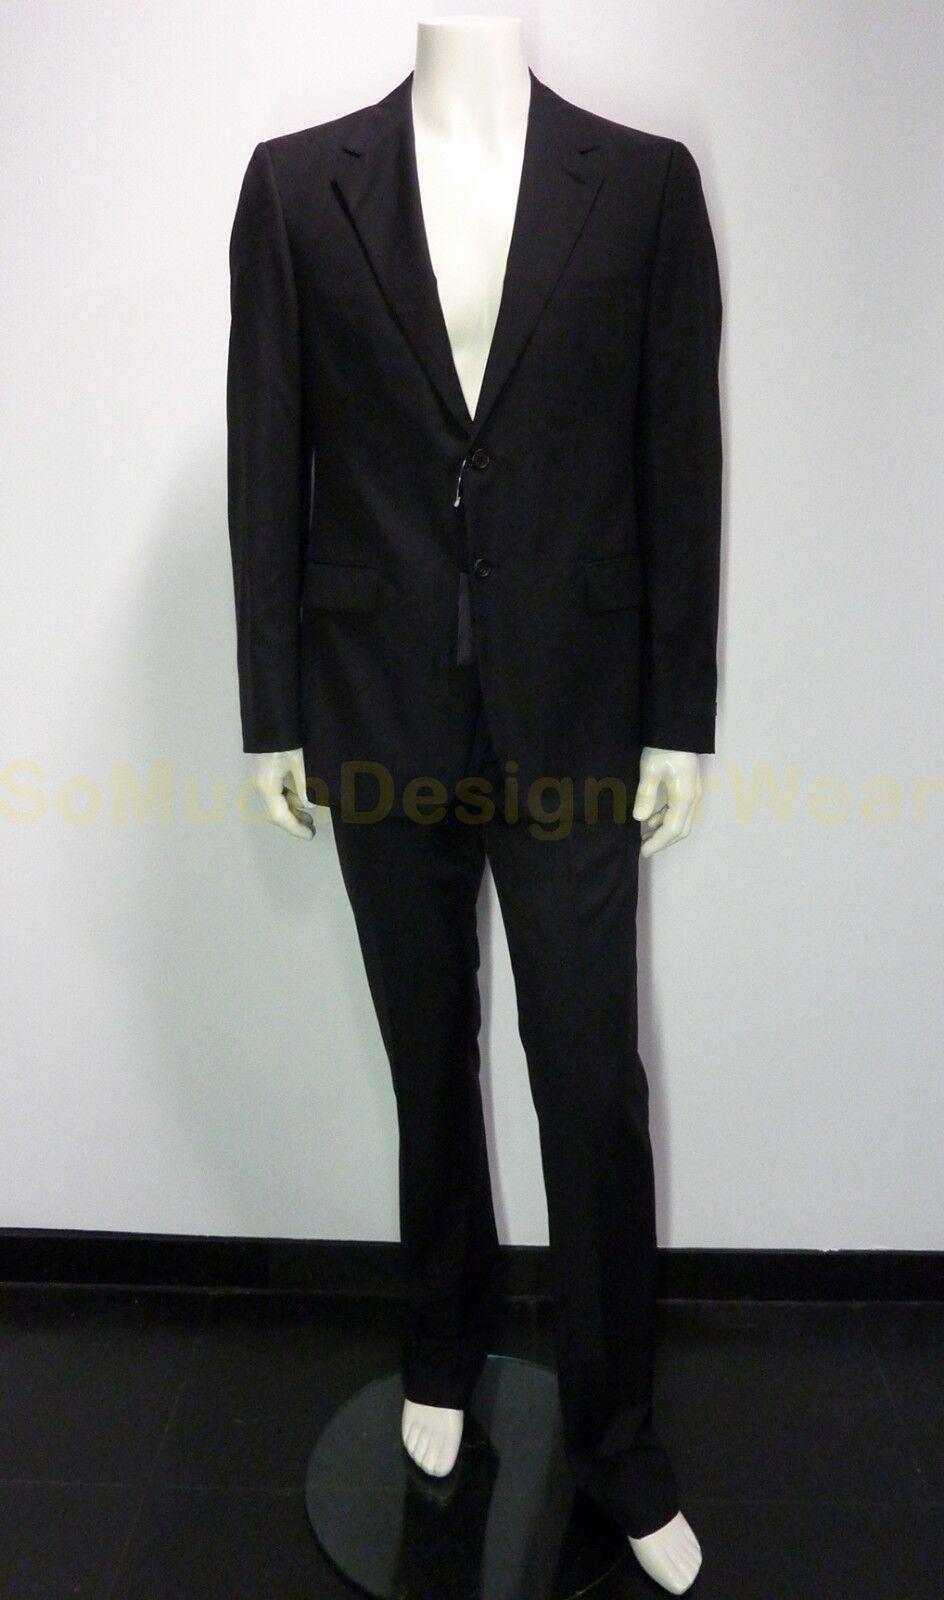 PRADA pak kostuum 52R zwart NIEUW+LABELS np